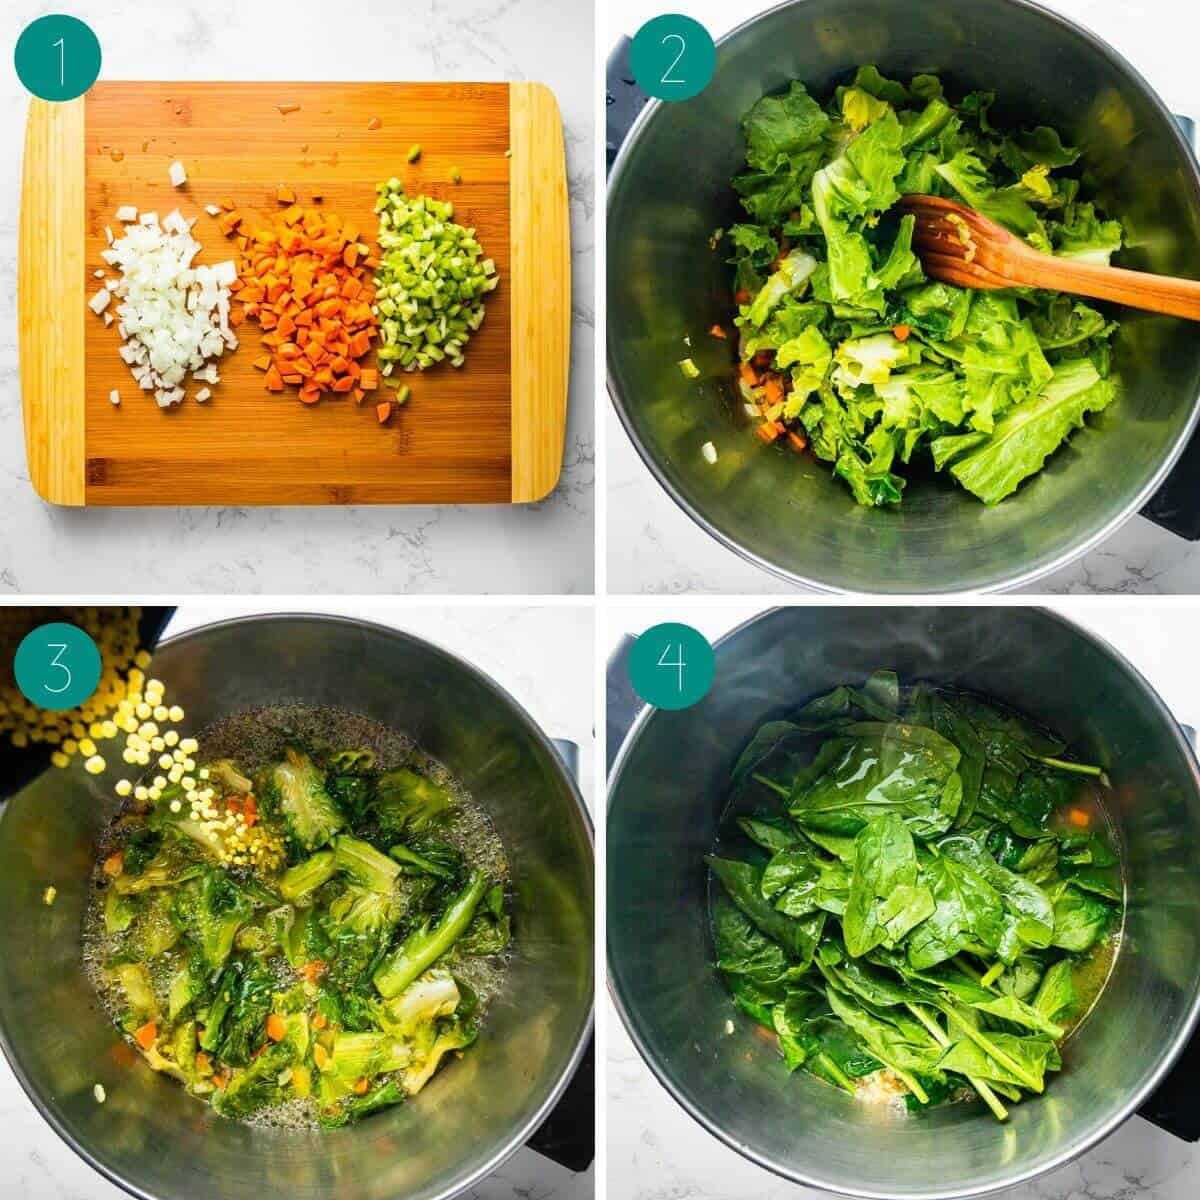 Italian wedding soup recipe process shot collage.